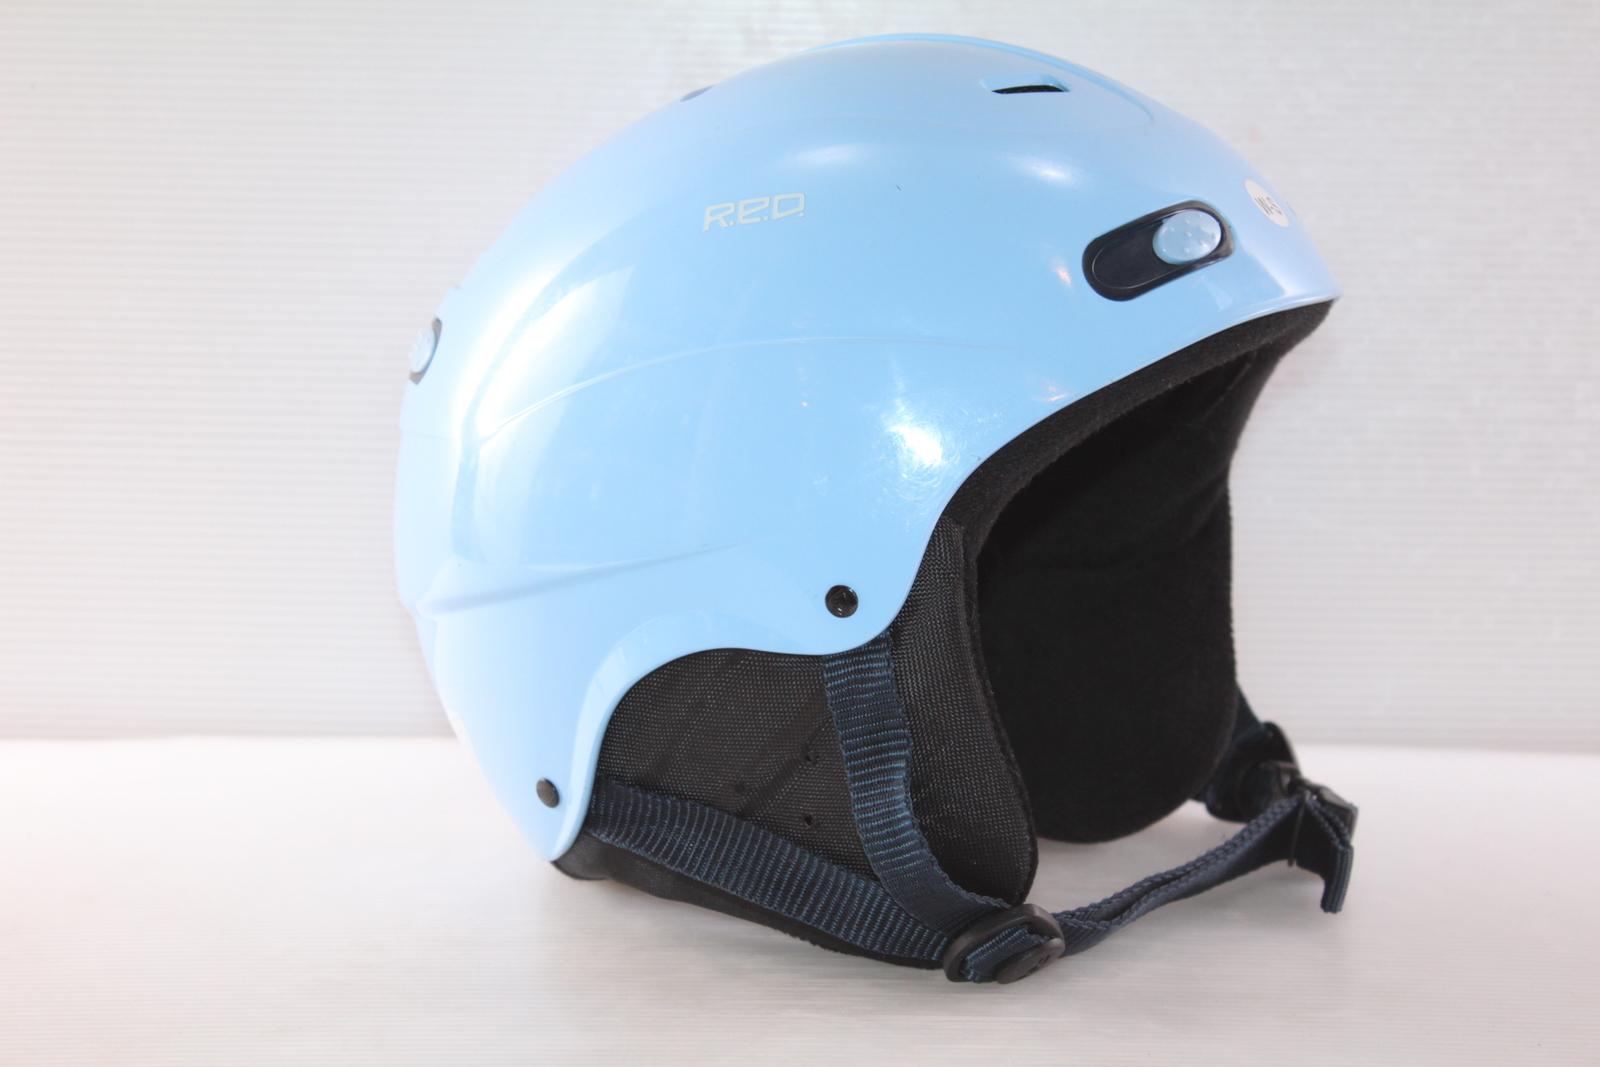 Dámská lyžařská helma R.E.D. Skycap vel. 54